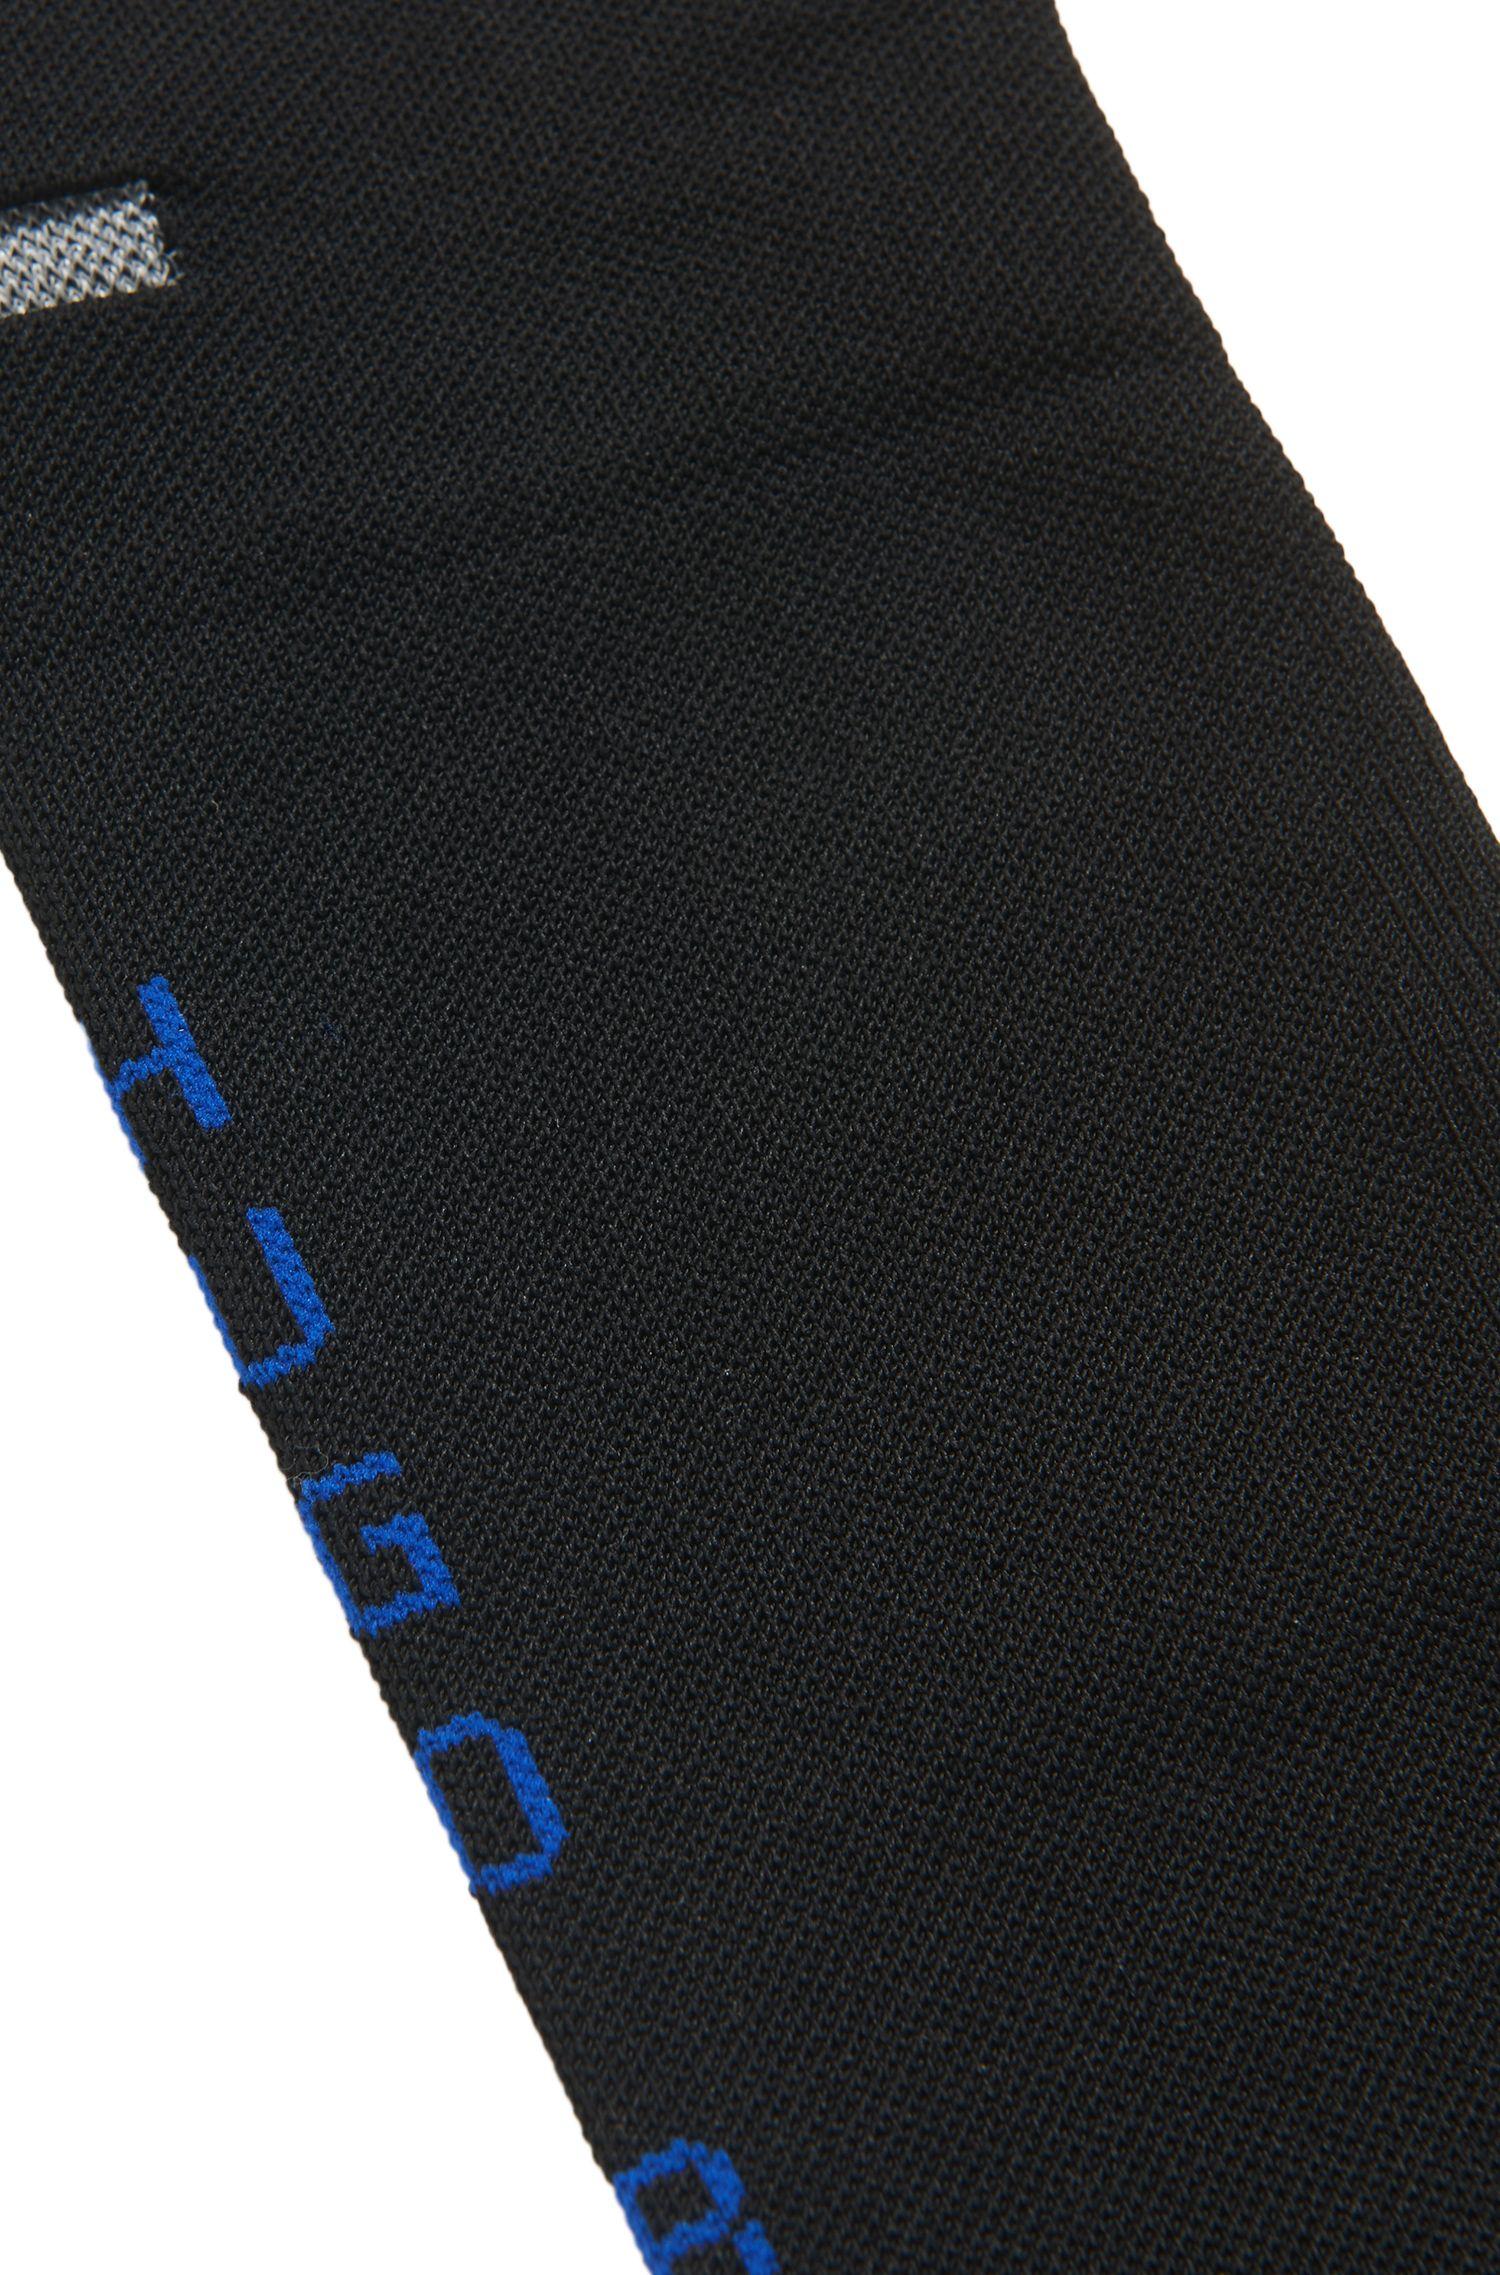 Knee-Length Compression Socks | KH Performance CMax, Black